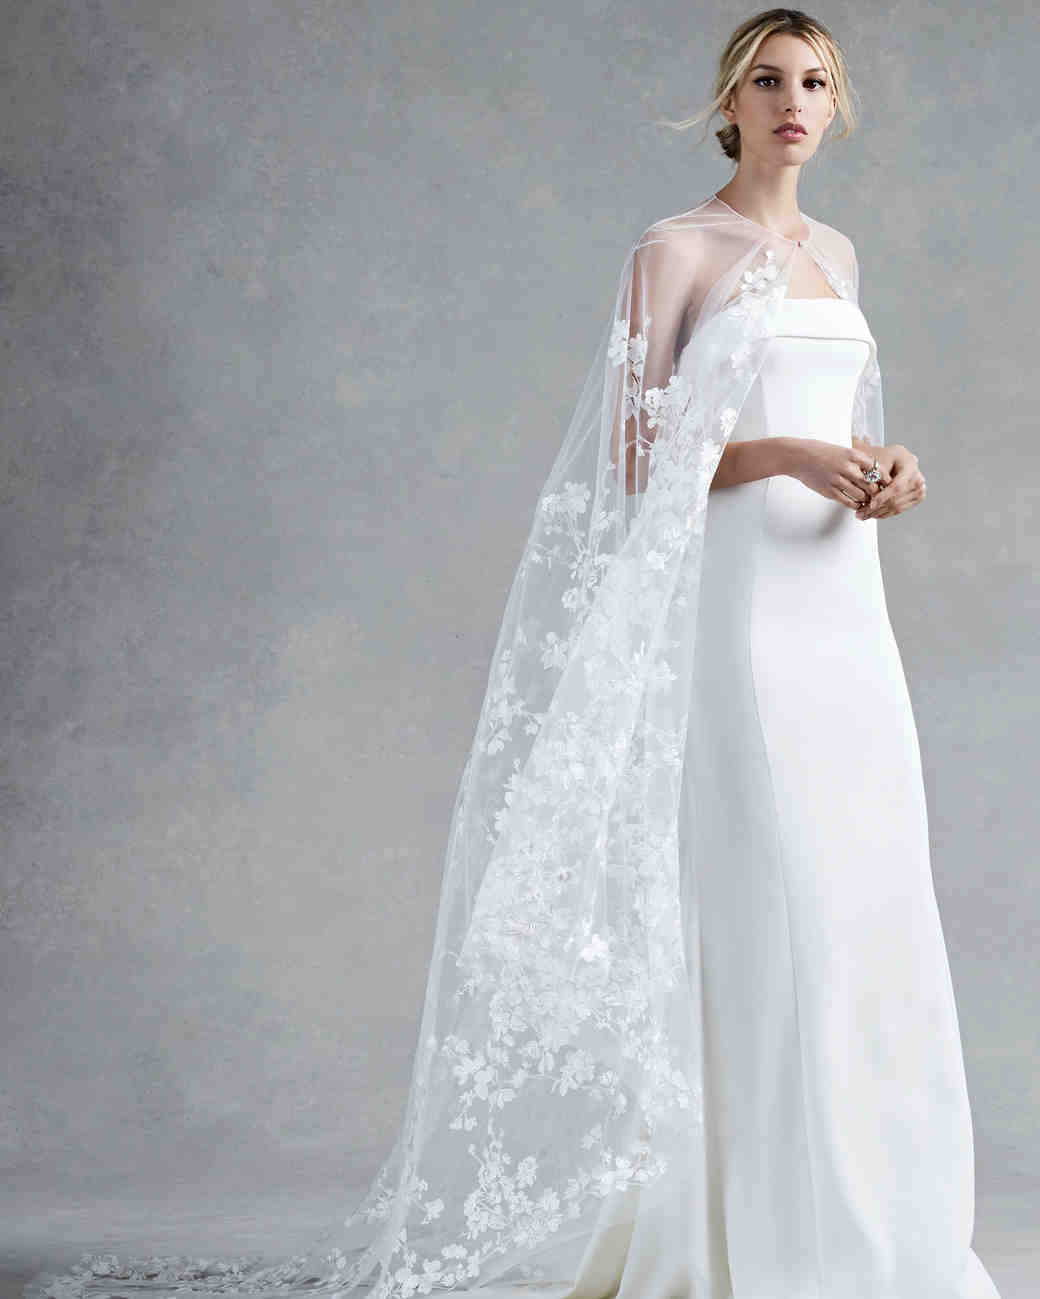 Temperley fall 2017 wedding dress collection martha stewart weddings oscar de la renta fall 2017 wedding dress collection junglespirit Choice Image